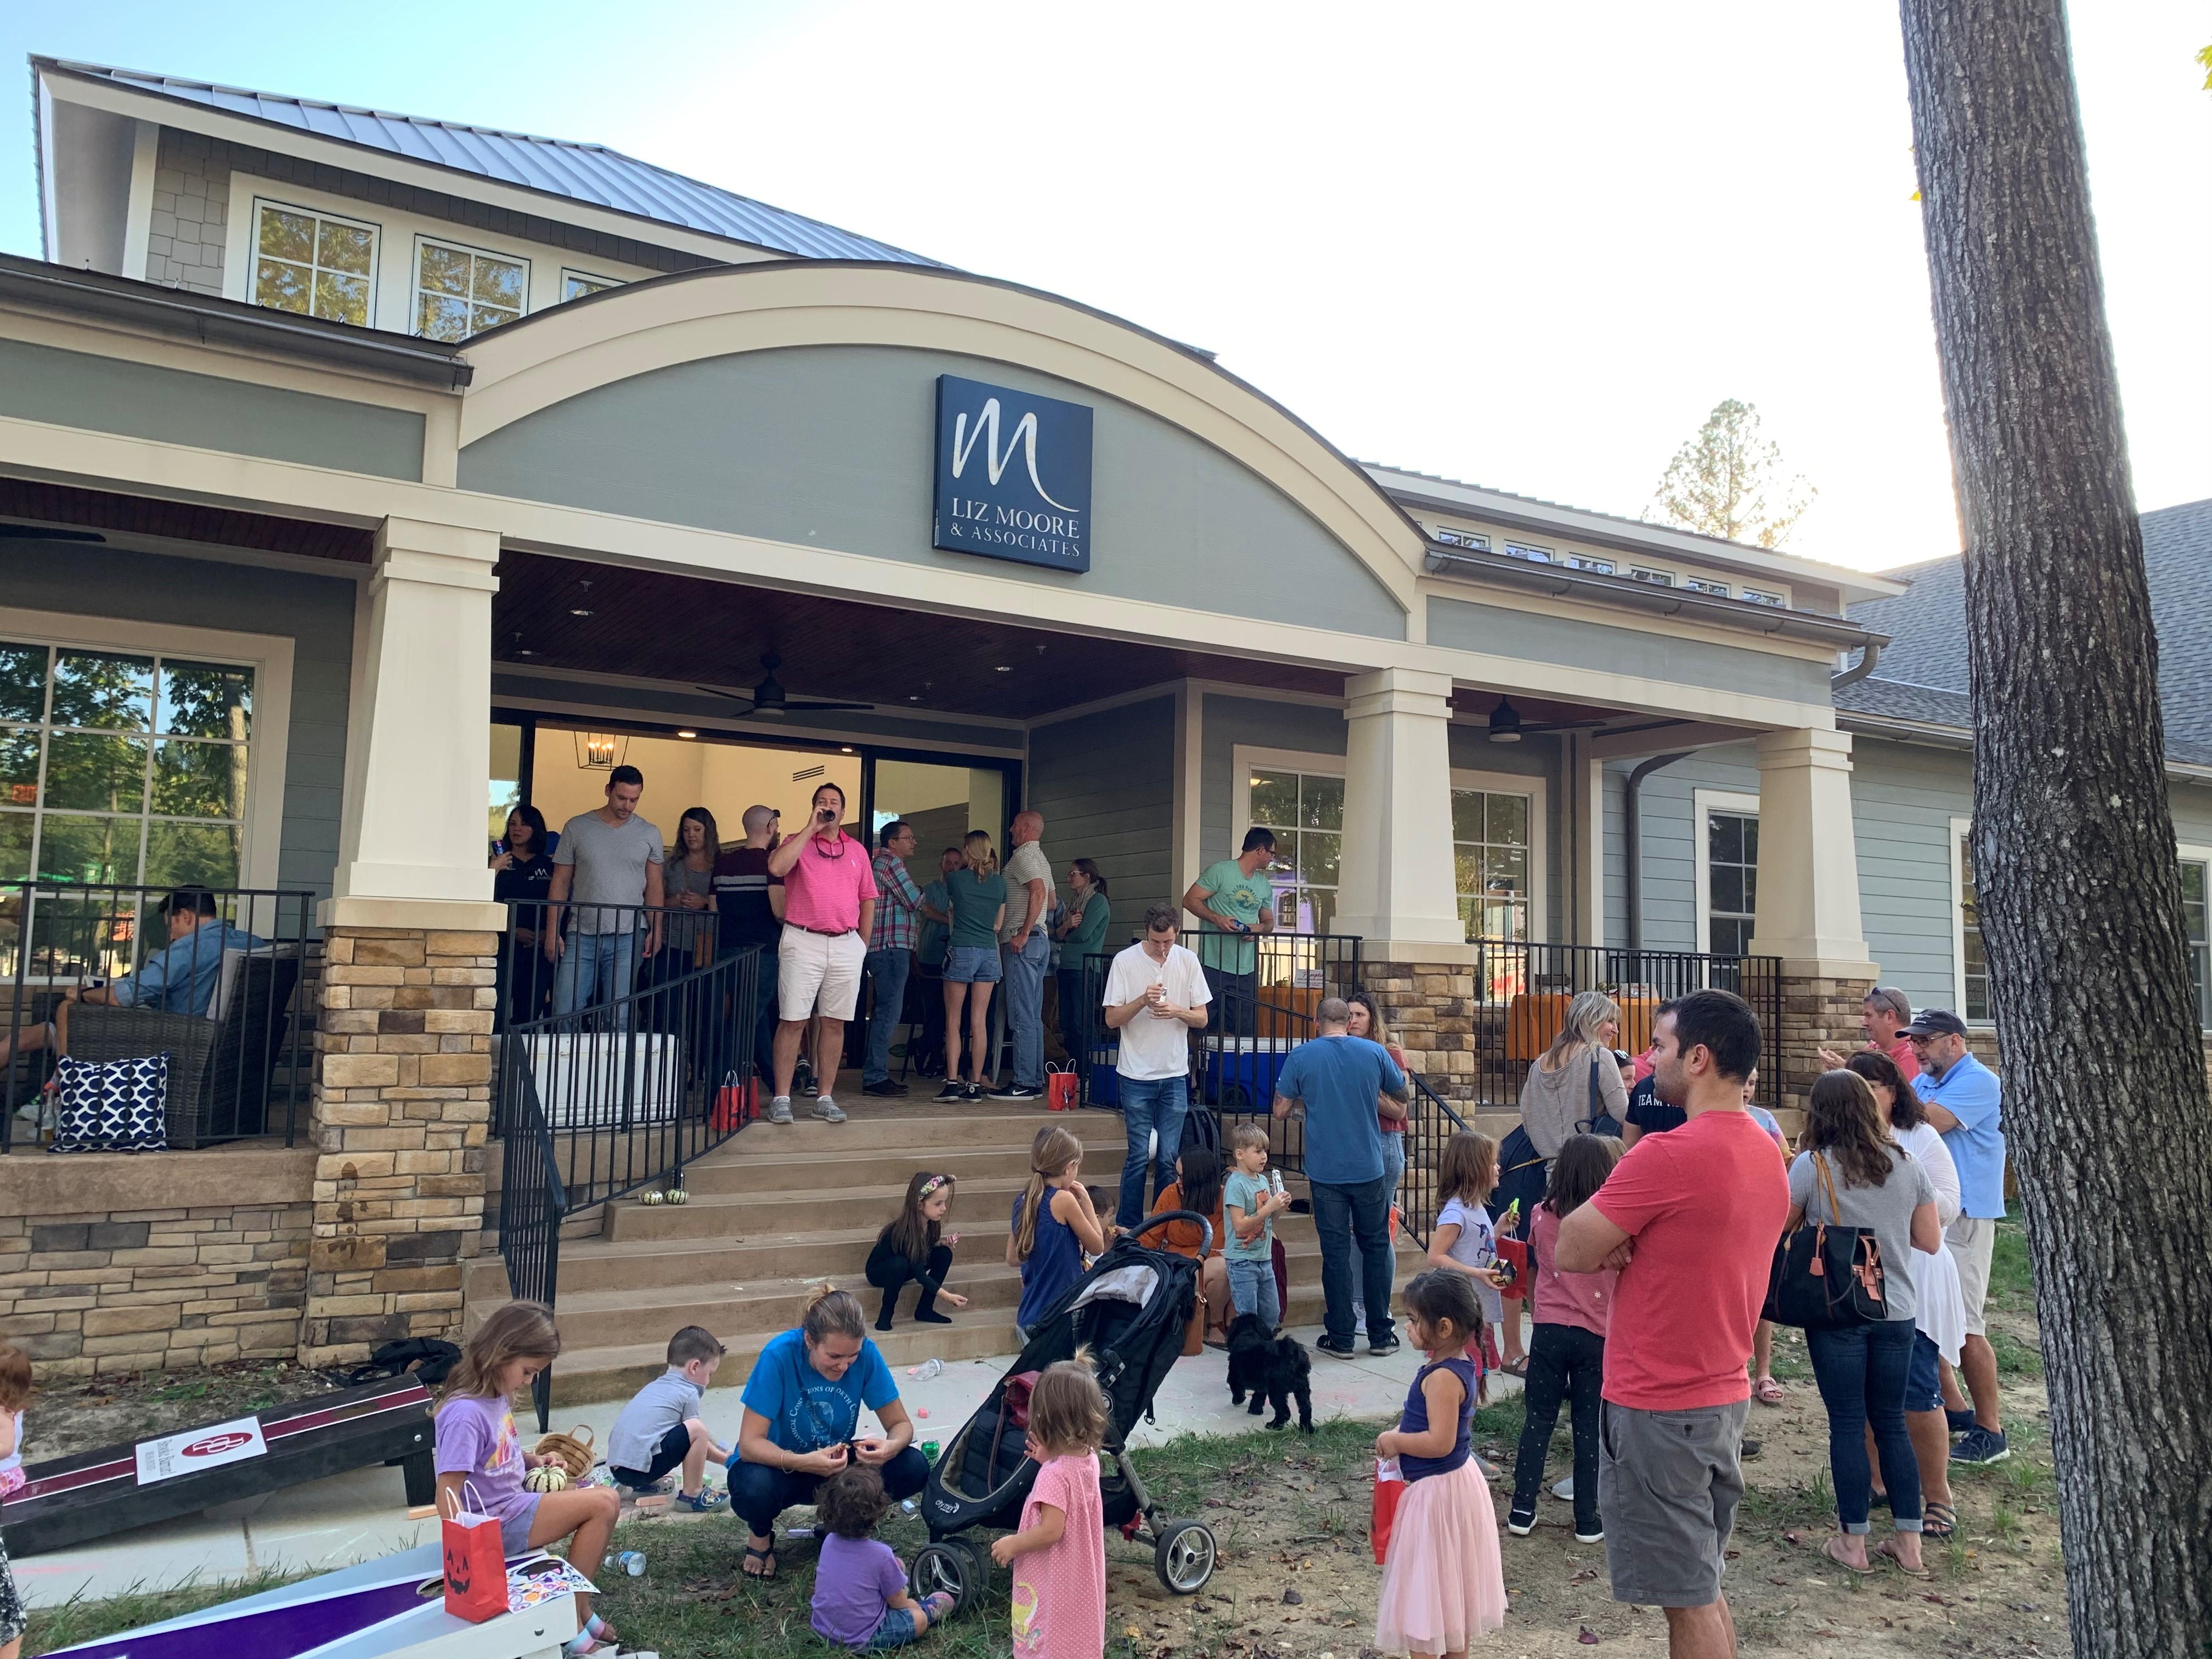 Liz Moore & Associates Chili Cook-Off Raises Money for Sanctuary Rescue